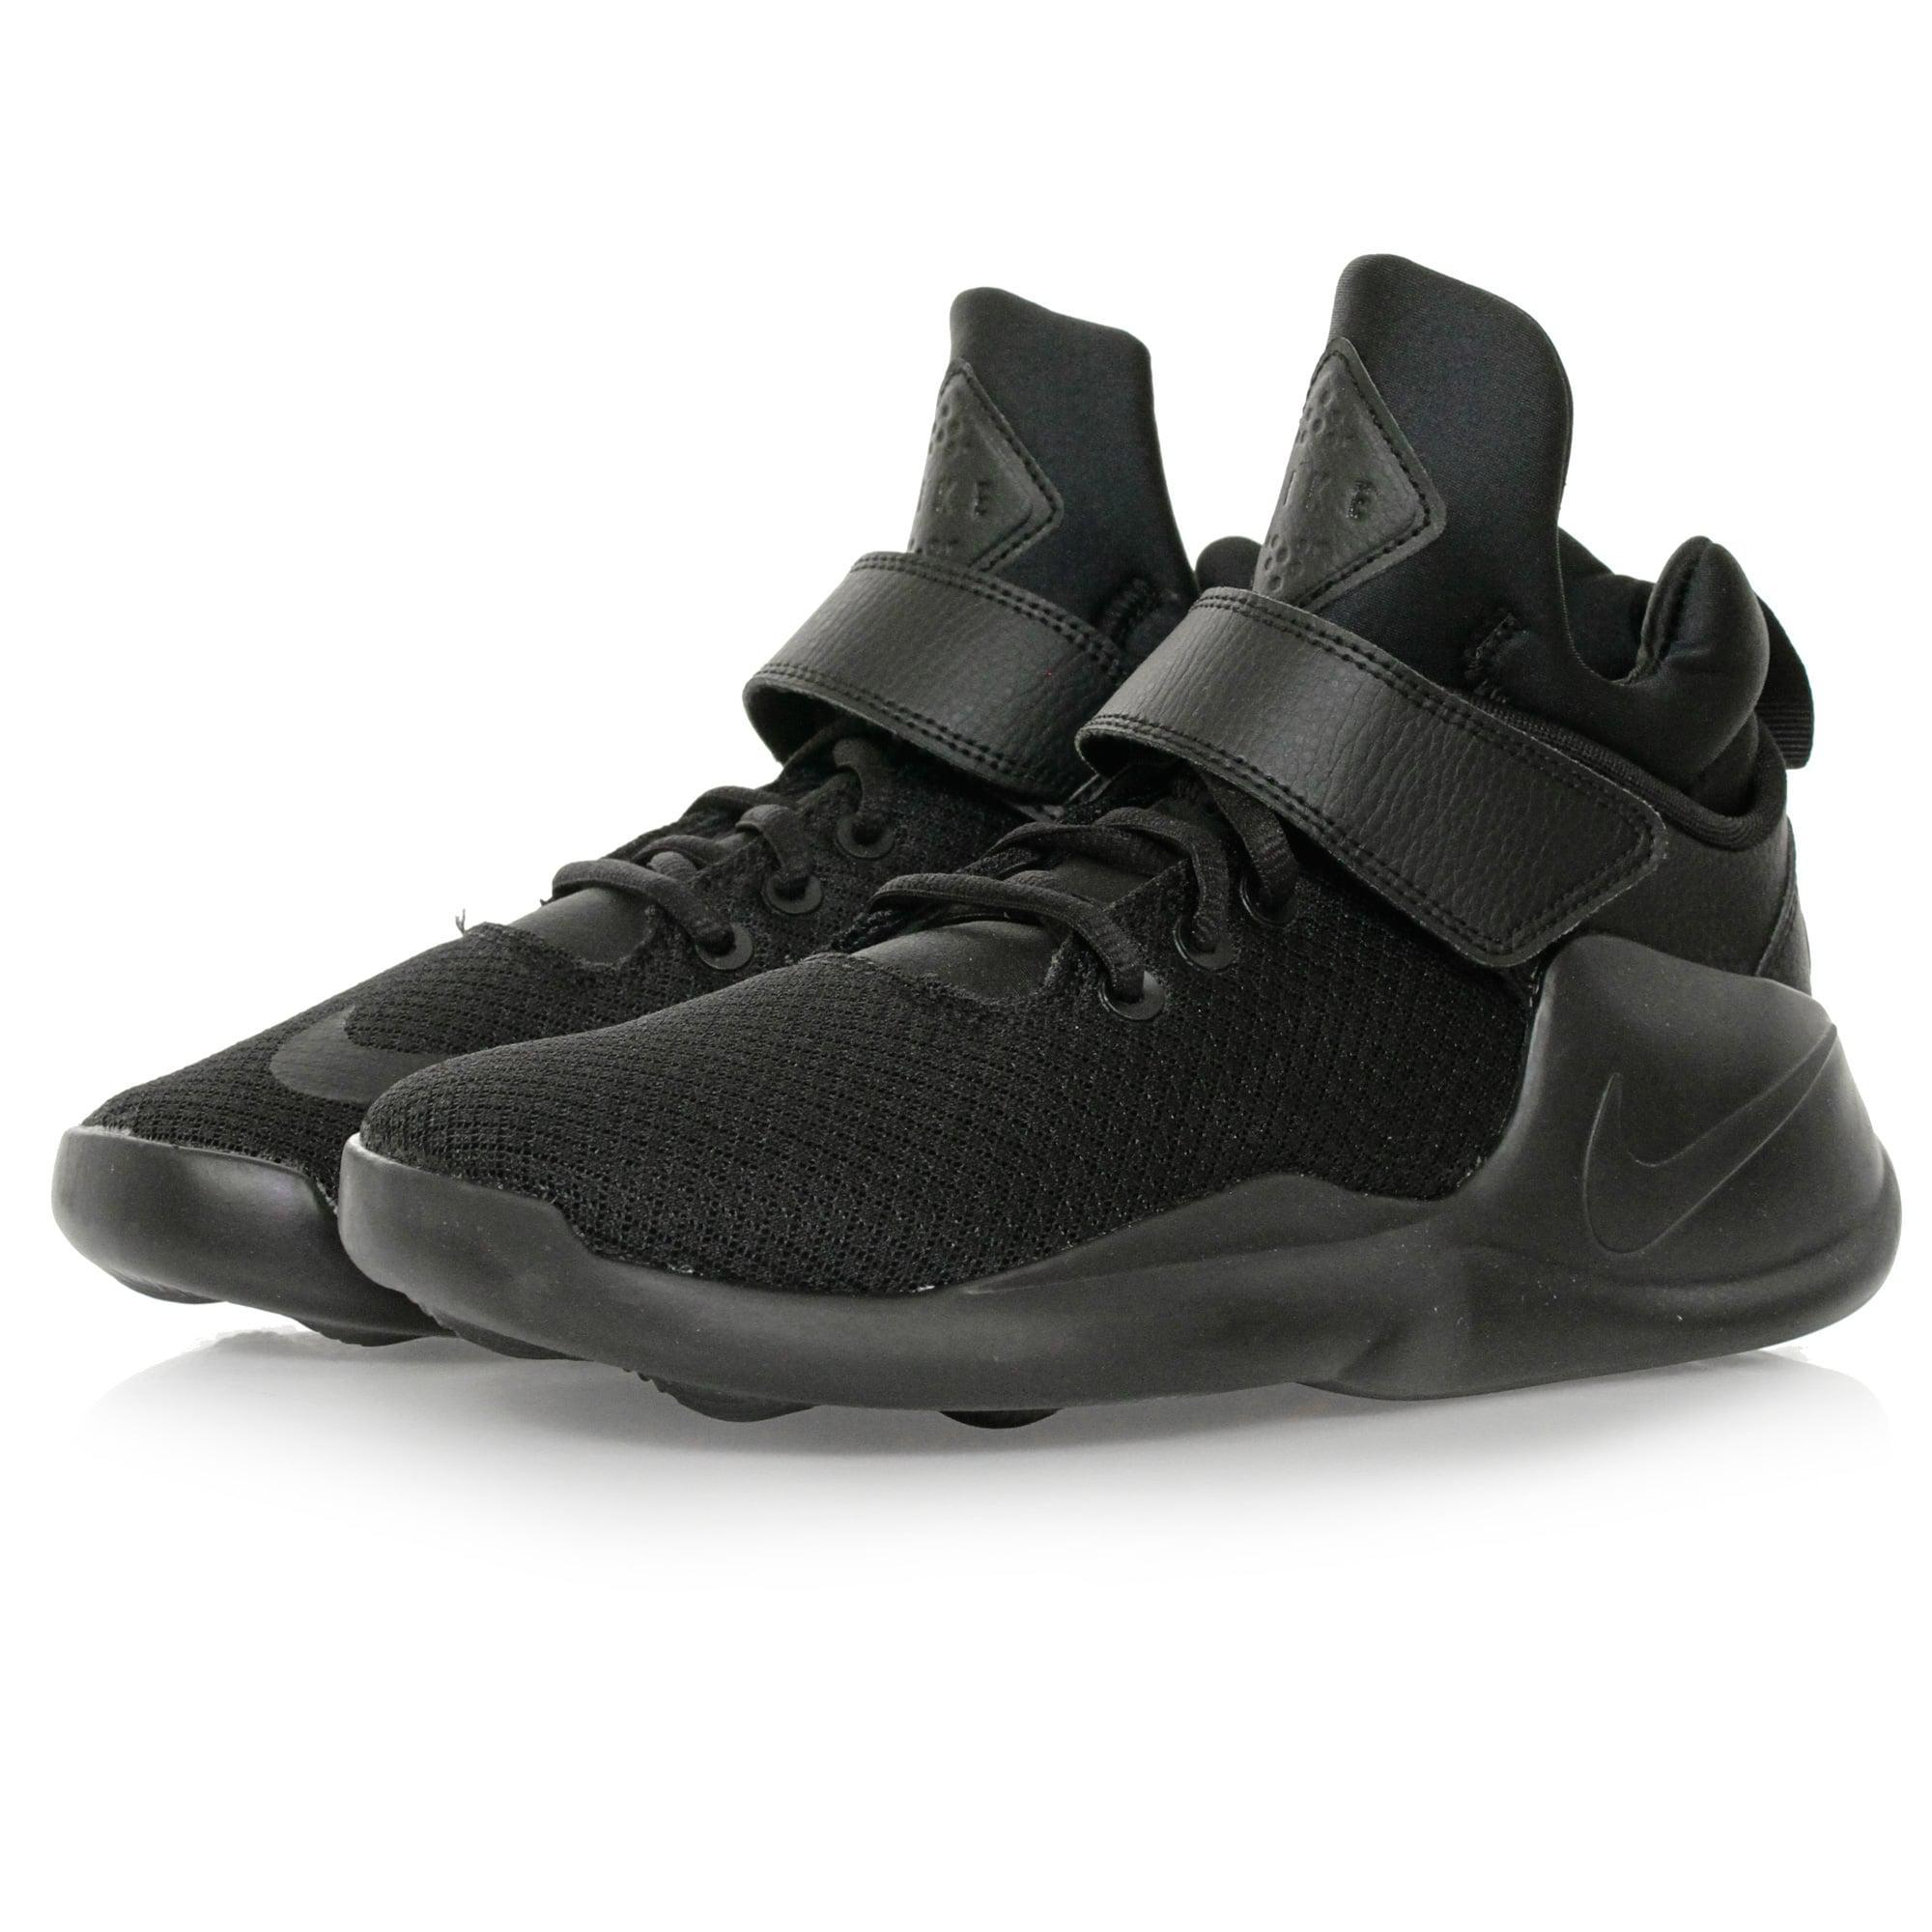 info for 6ac6d 85277 Nike Kwazi Black Shoe 844839 001 in Black for Men - Lyst